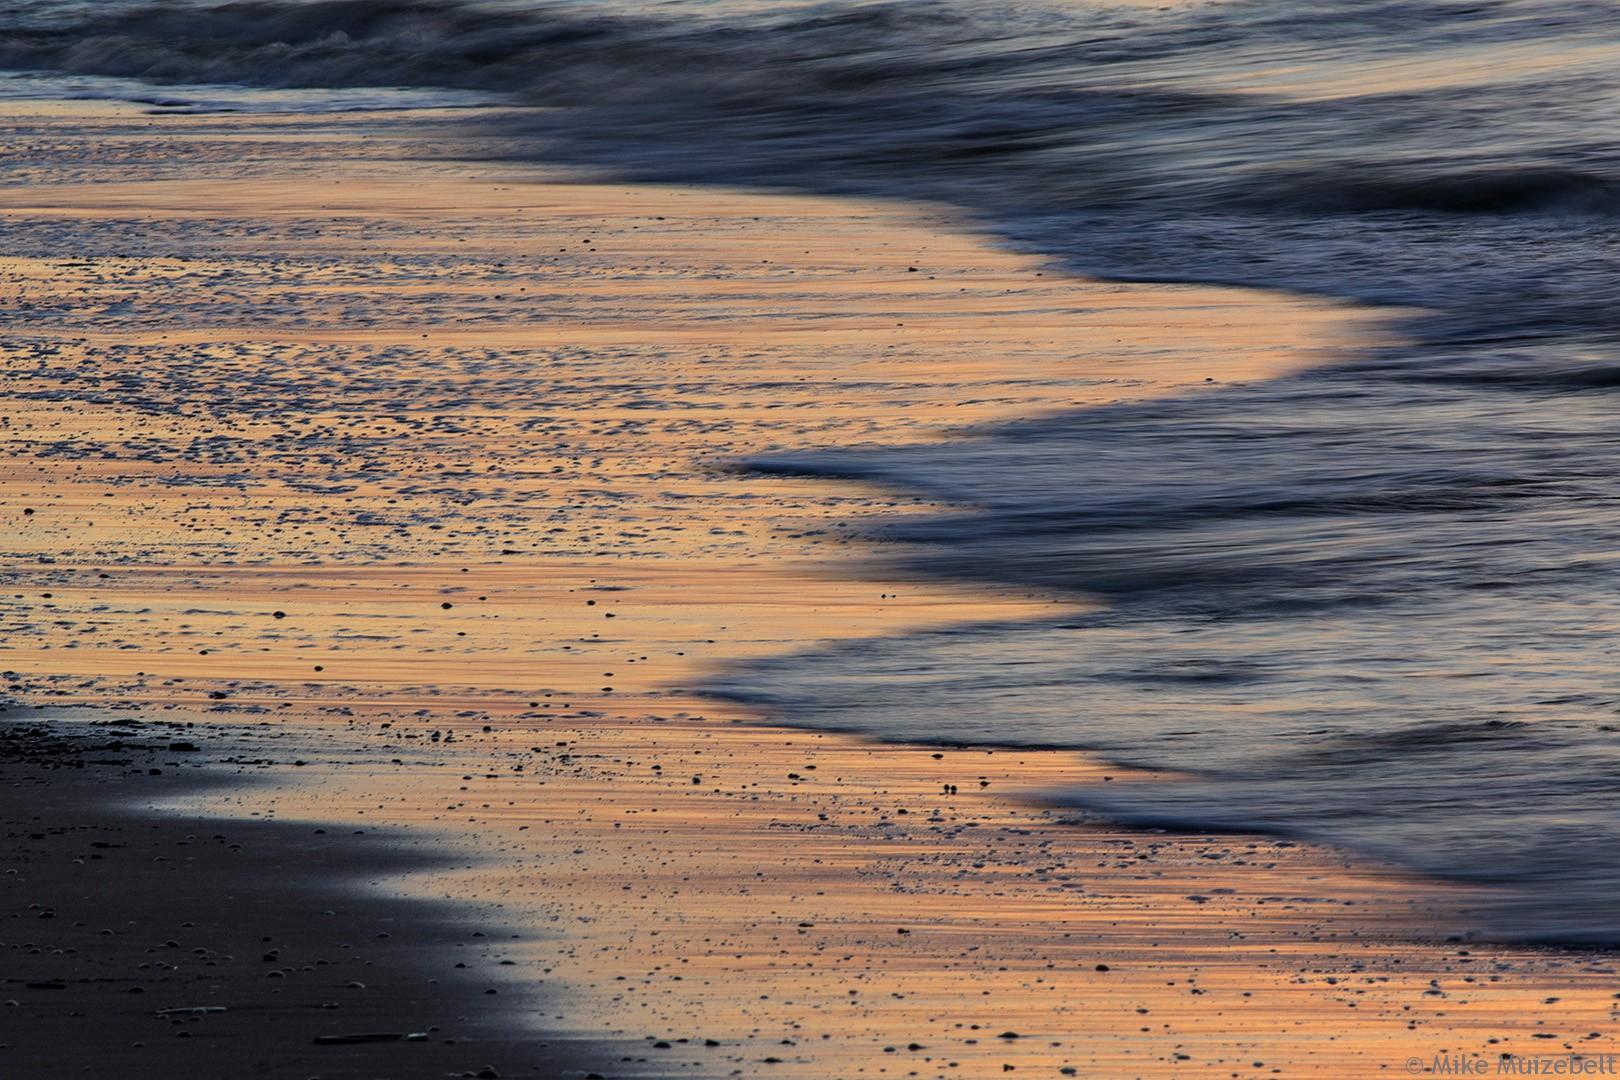 #wassenaar #sunset #beach #red #scheveningen #water #retreating #flow